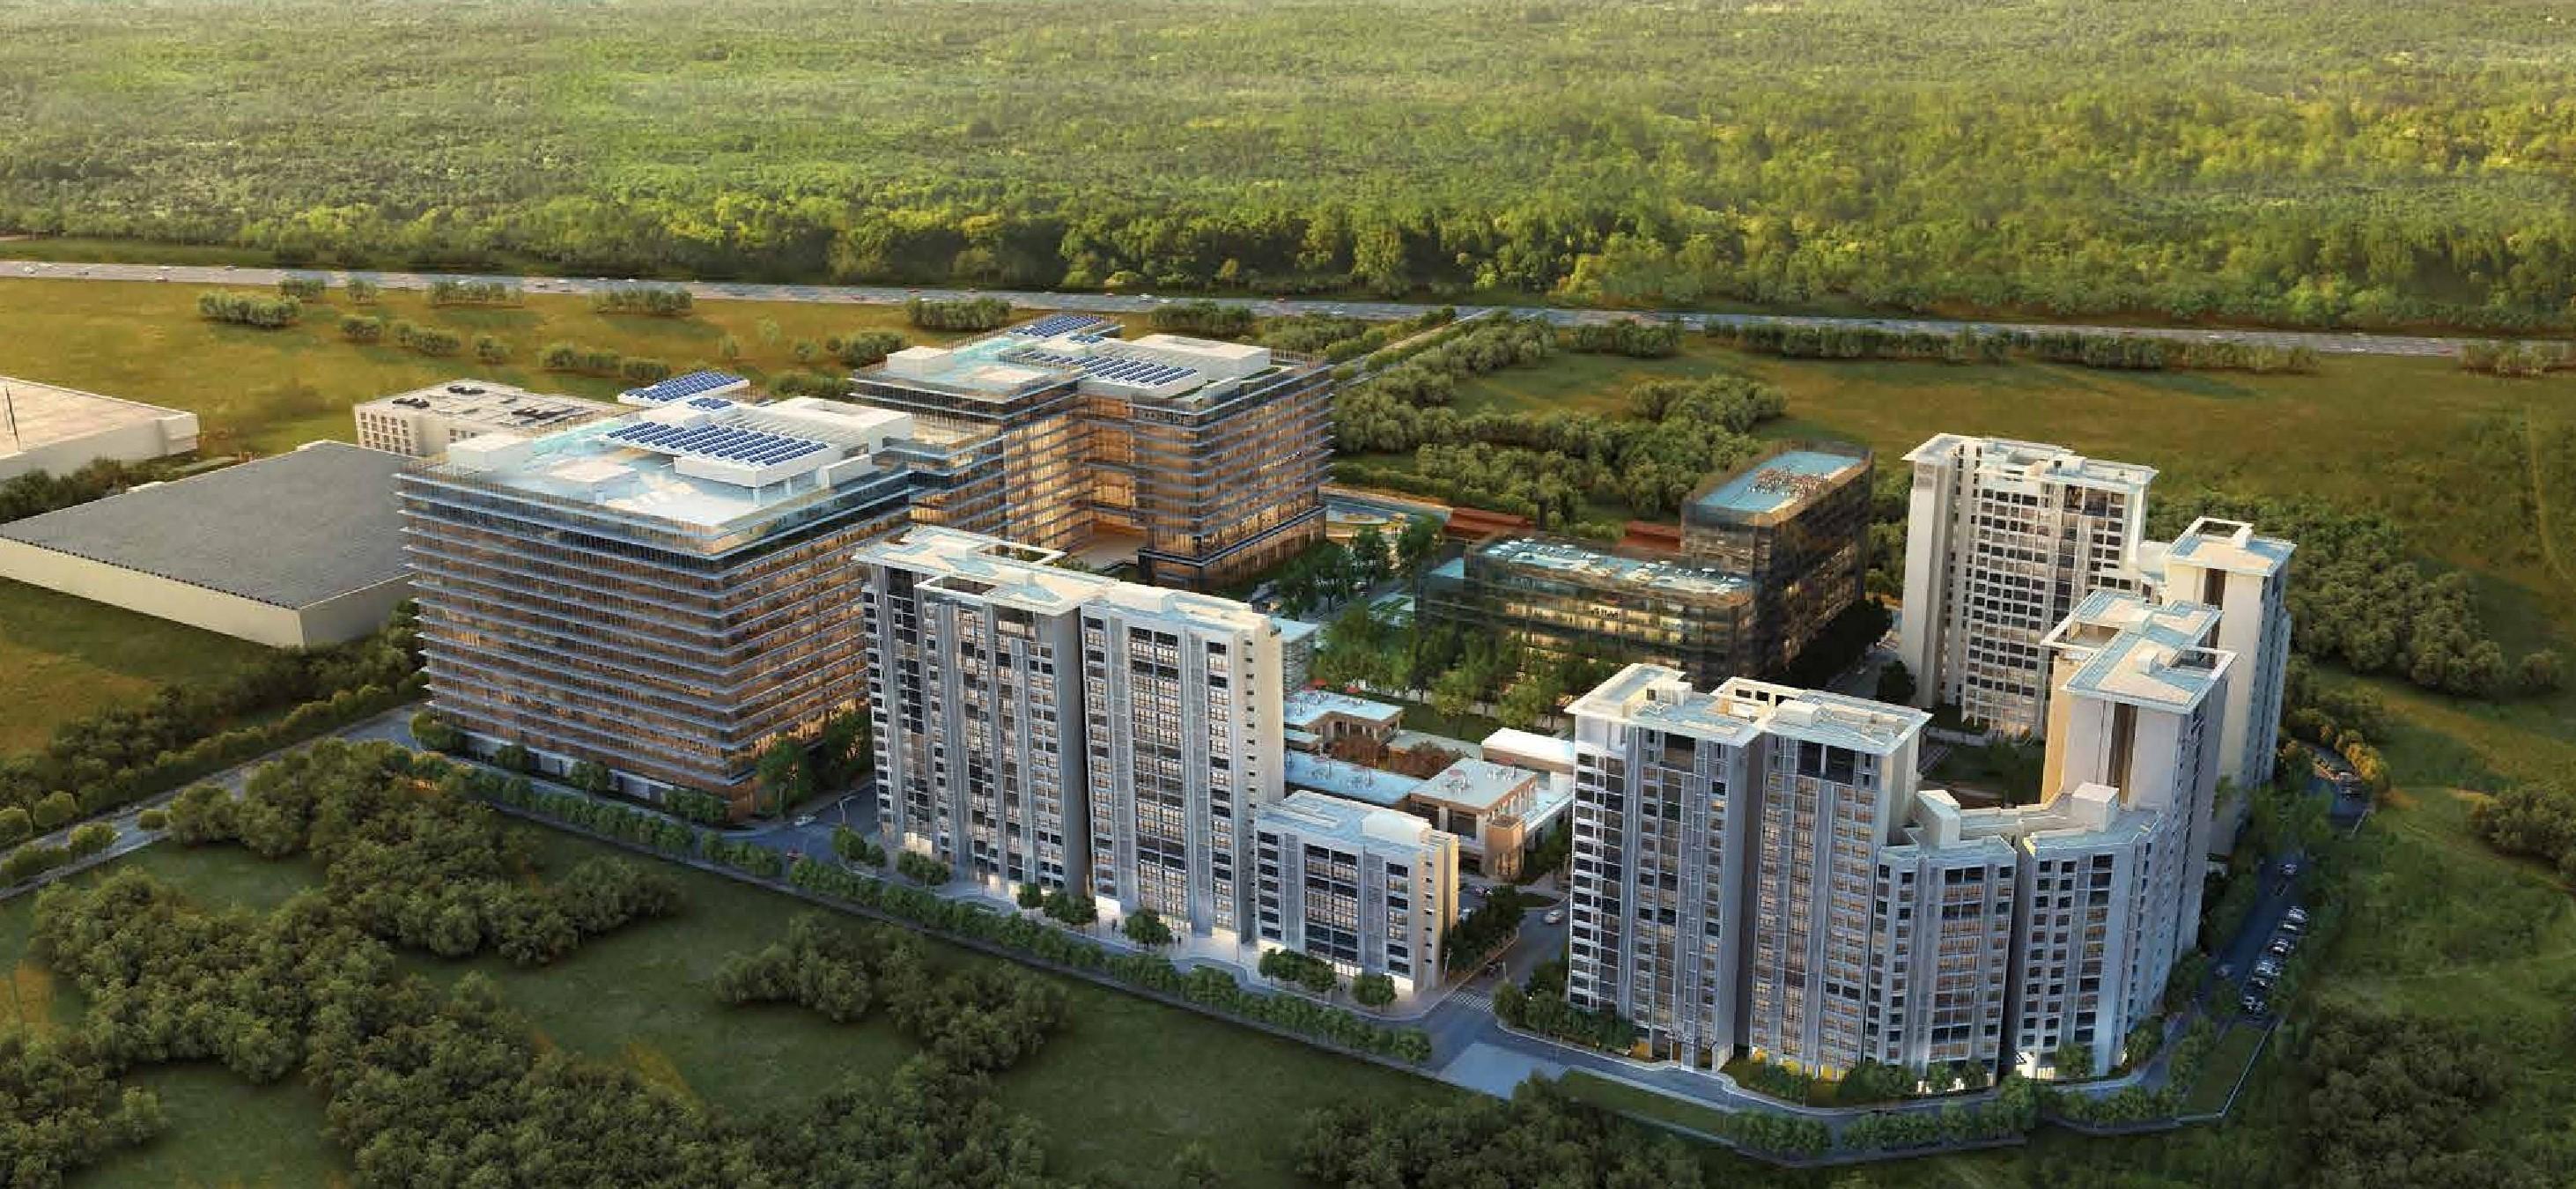 Godrej The Trees, Vikhroli, Mumbai real estate, Godrej Properties, India real estate news, Indian property market, Track2Realty, NRI investment, New launches in Mumbai